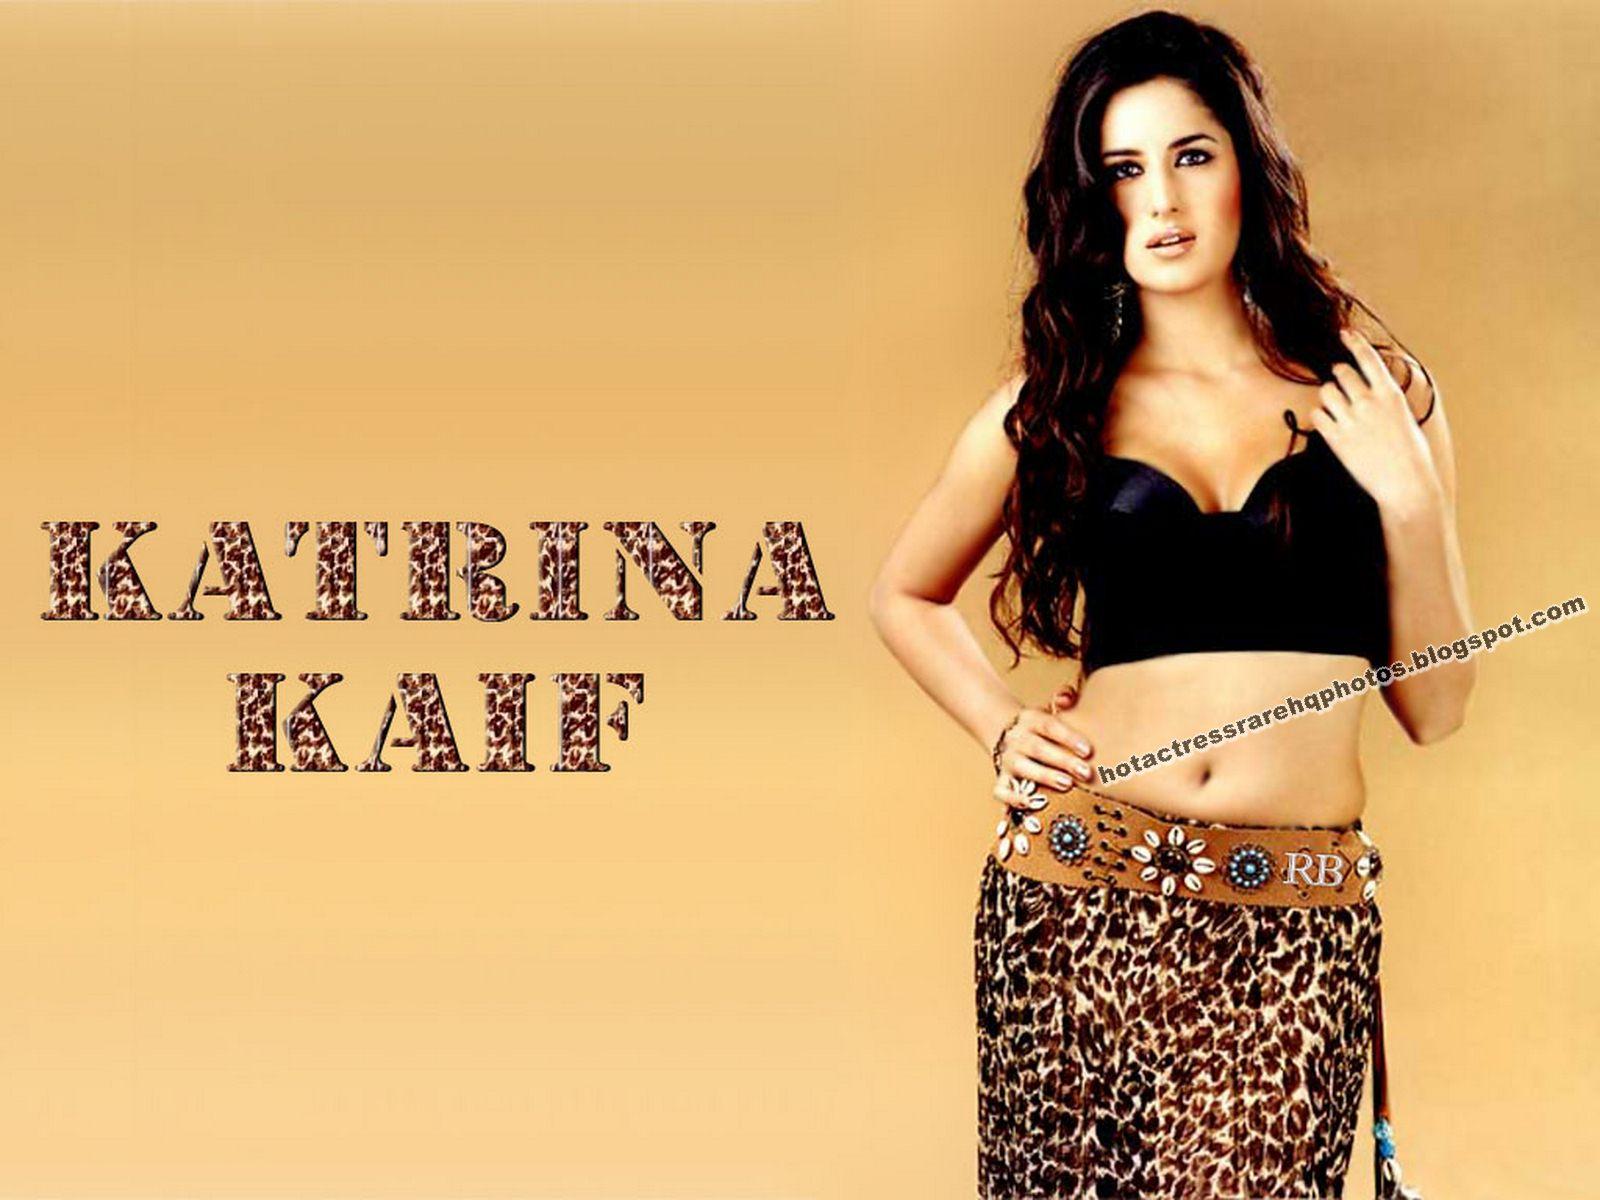 Hot Indian Actress Rare Hq Photos Hottest Bollywood -1981